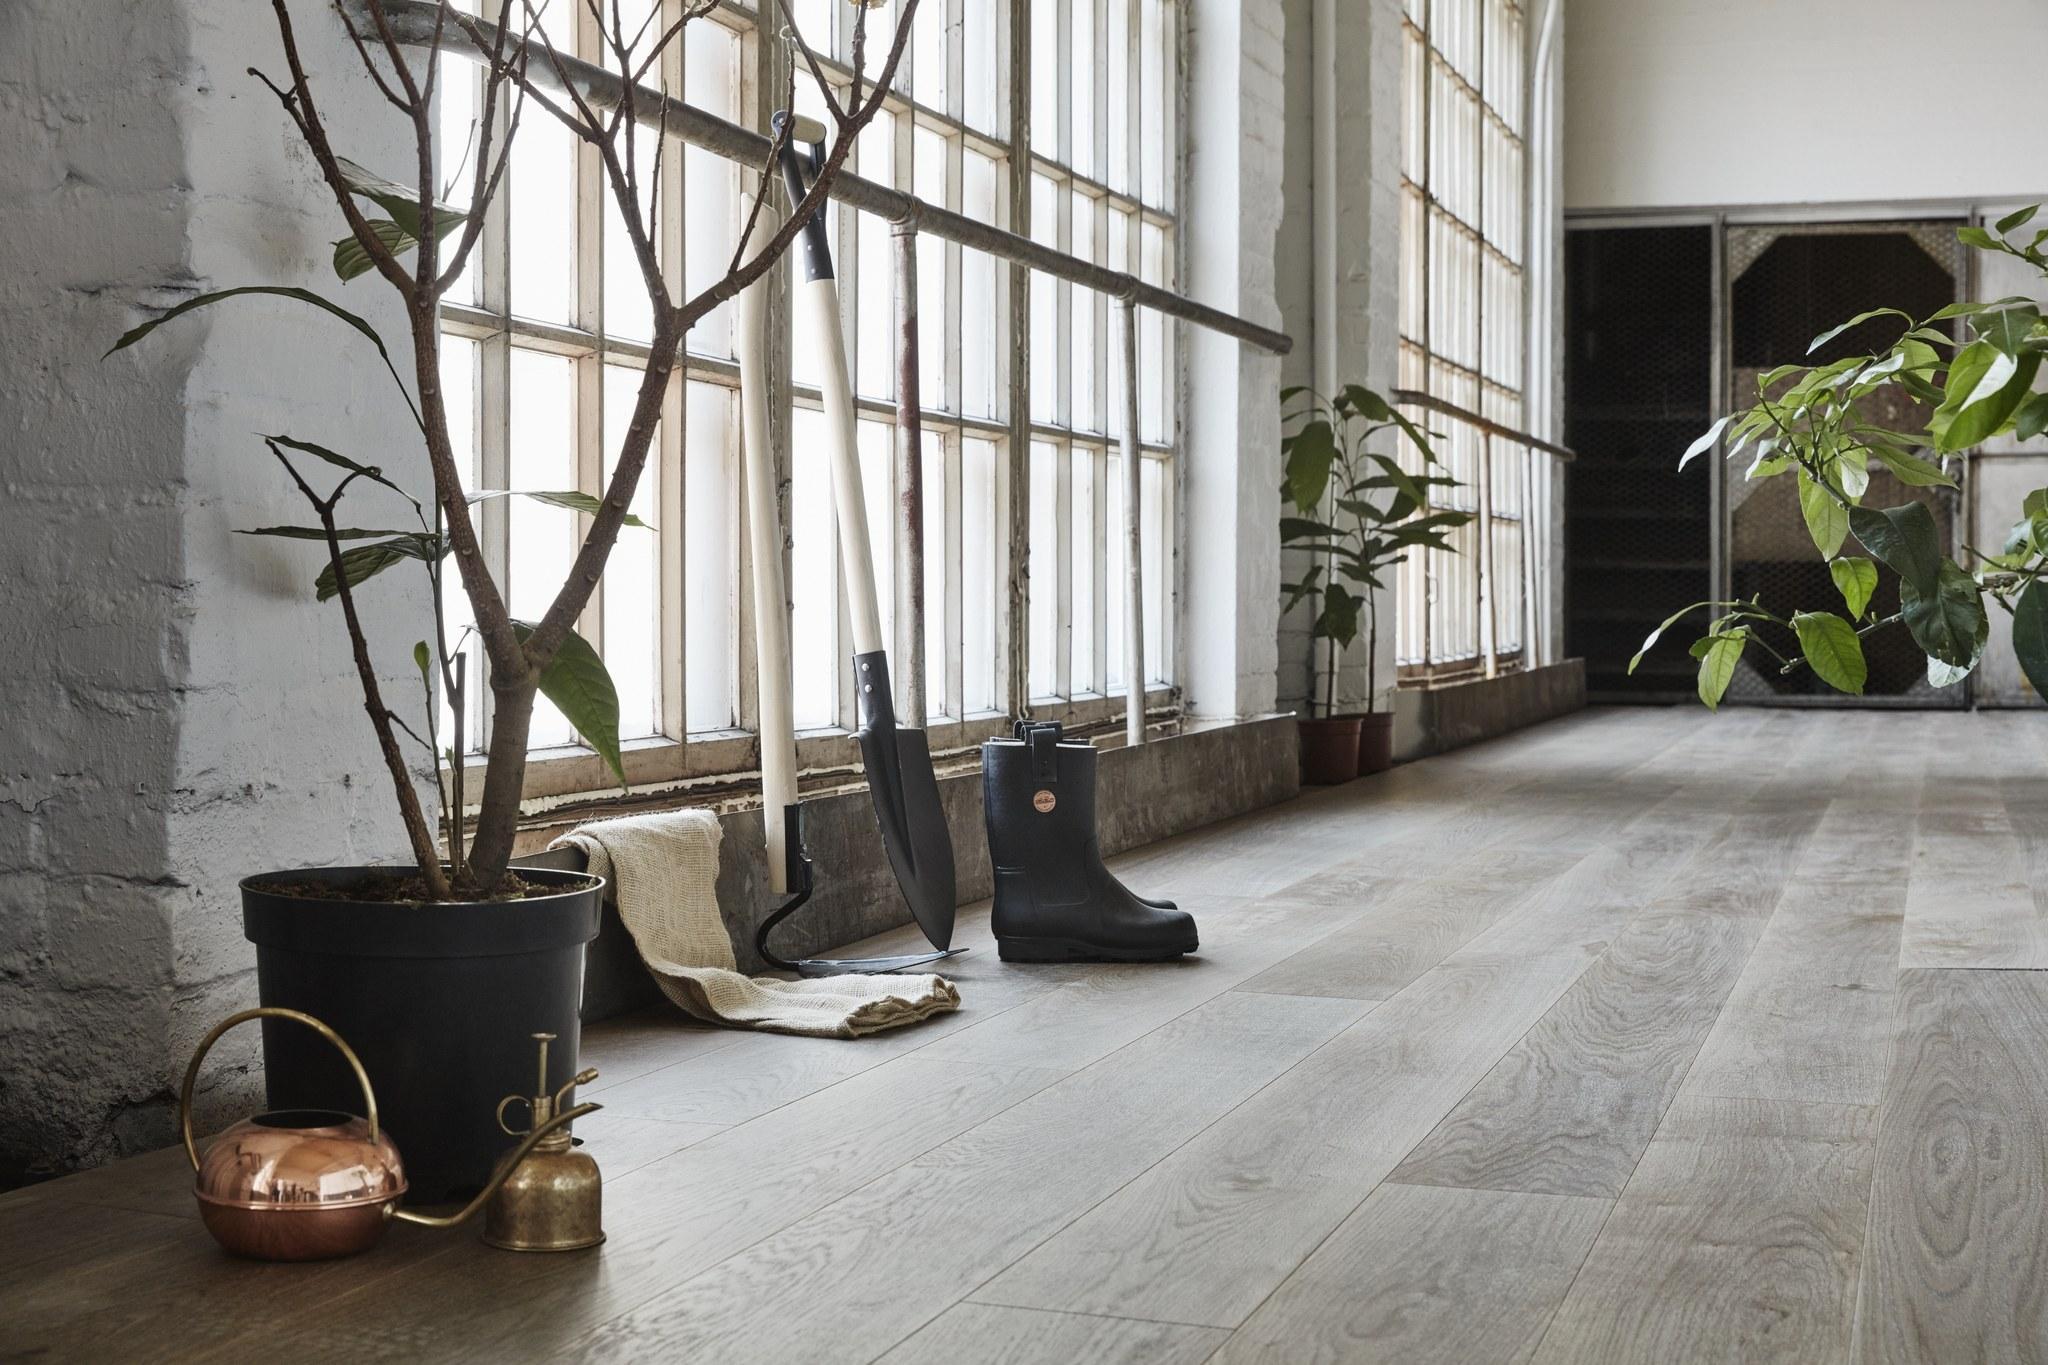 Timberwise parketti puulattia wooden floor parquet Tammi Oak Pallas